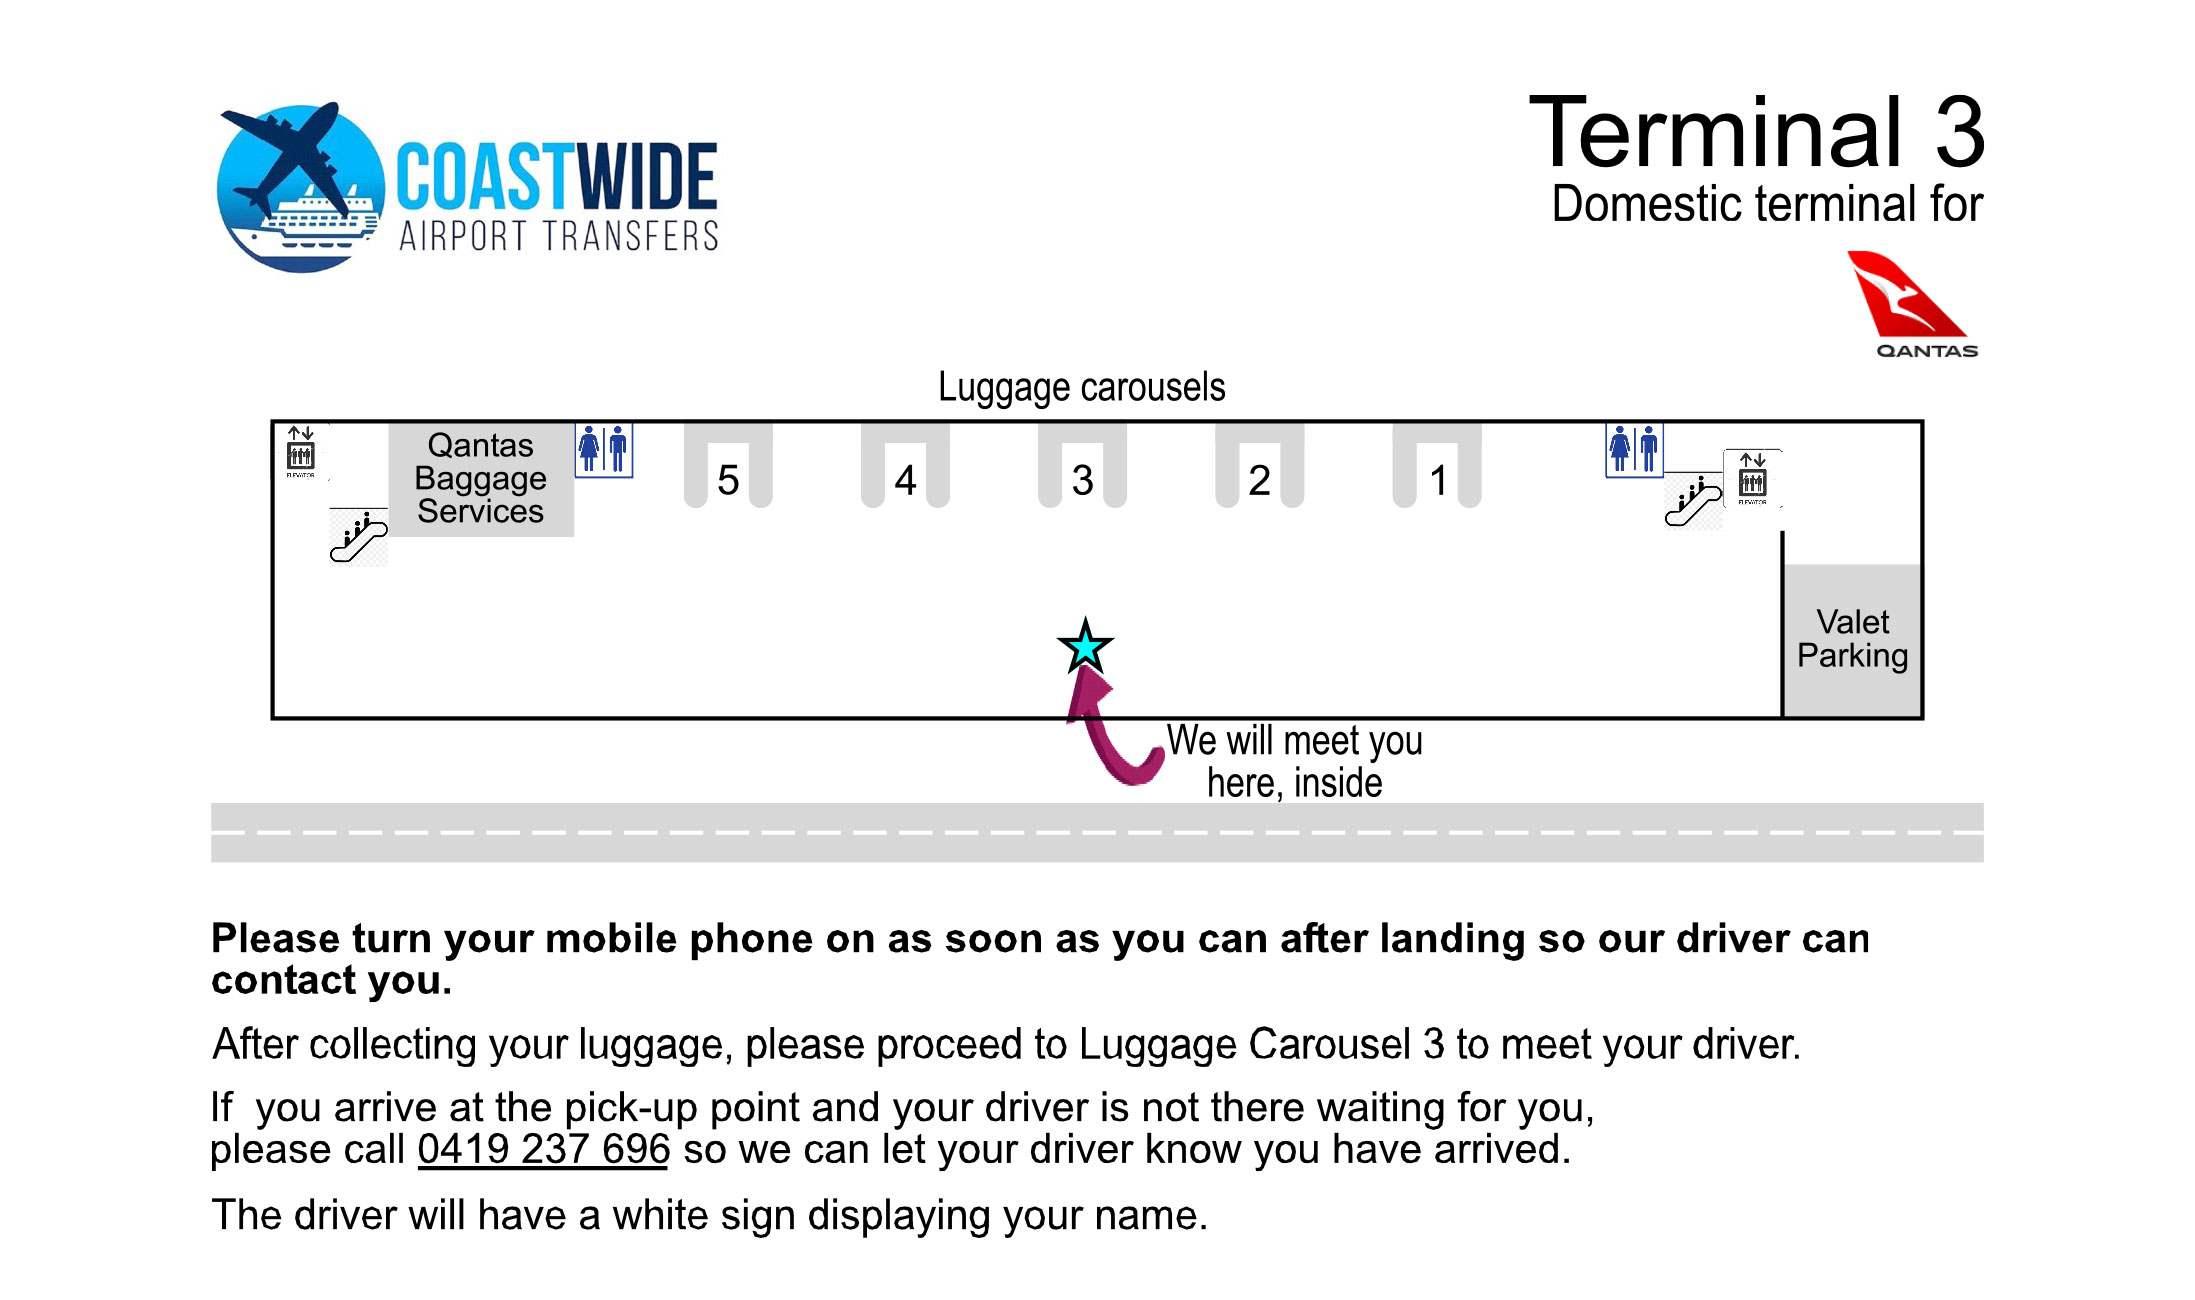 Terminal 3 - Domestic